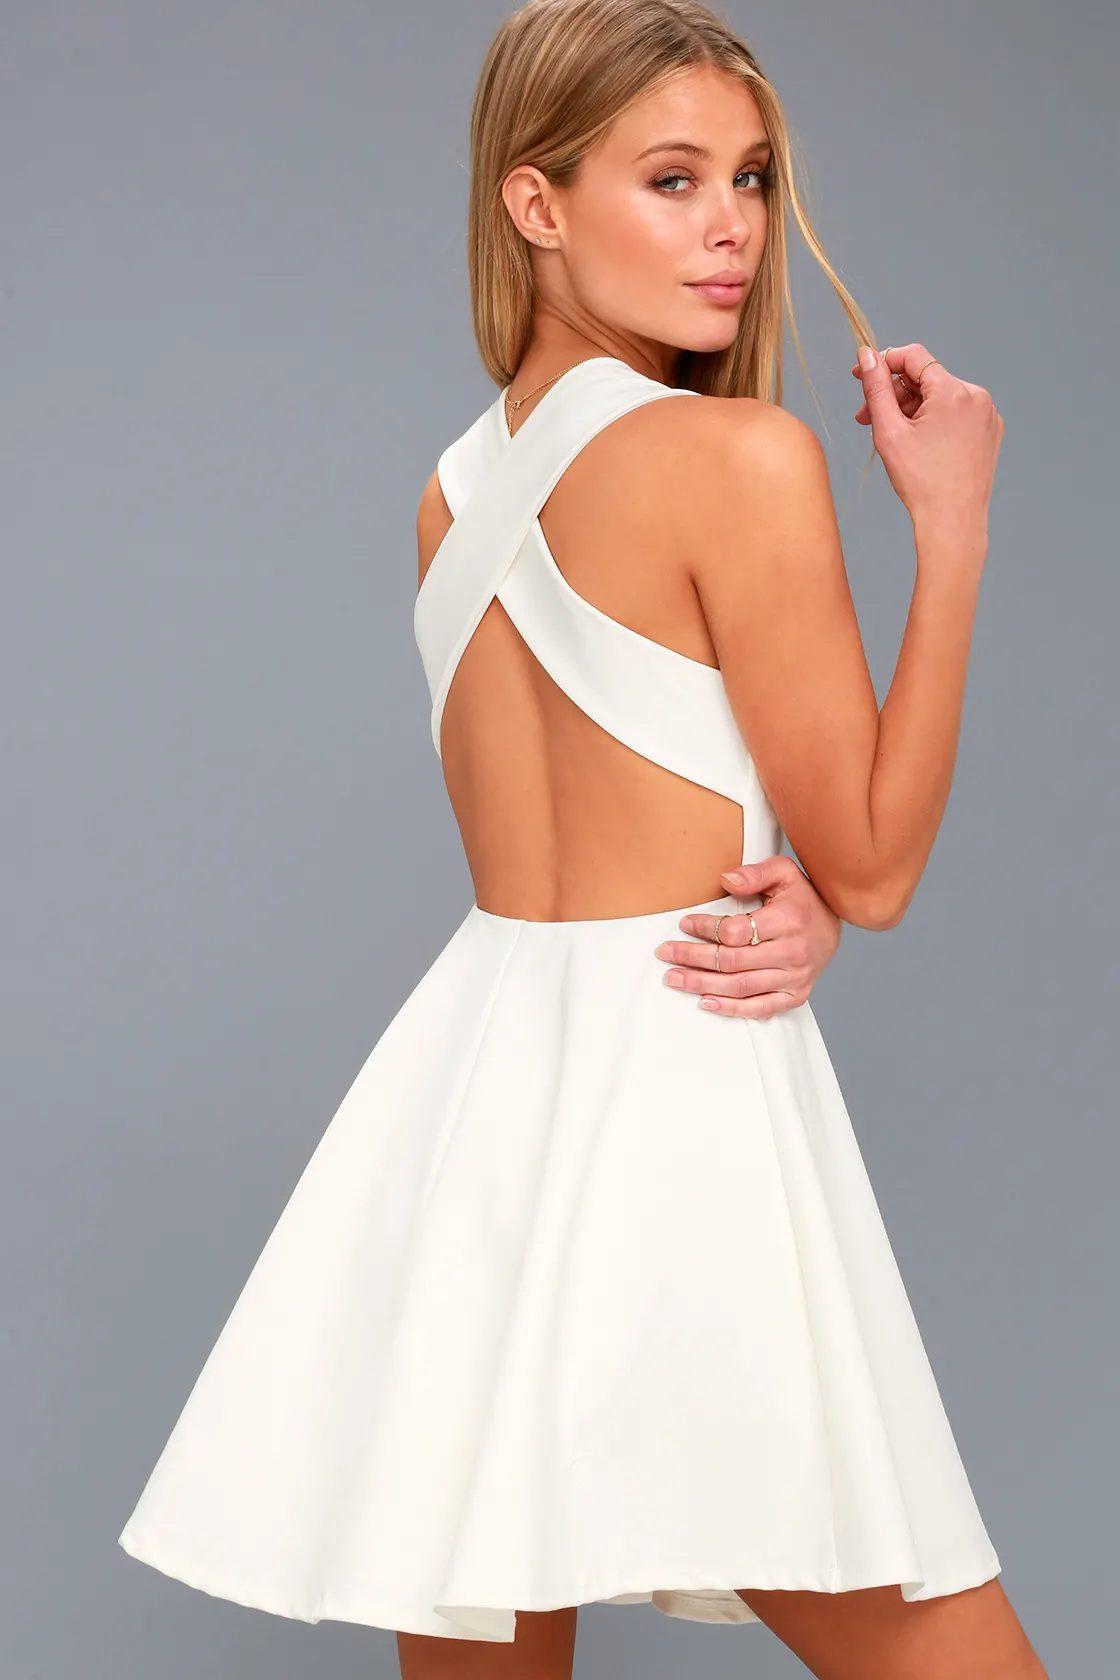 Backless white graduation dress in A-line shape